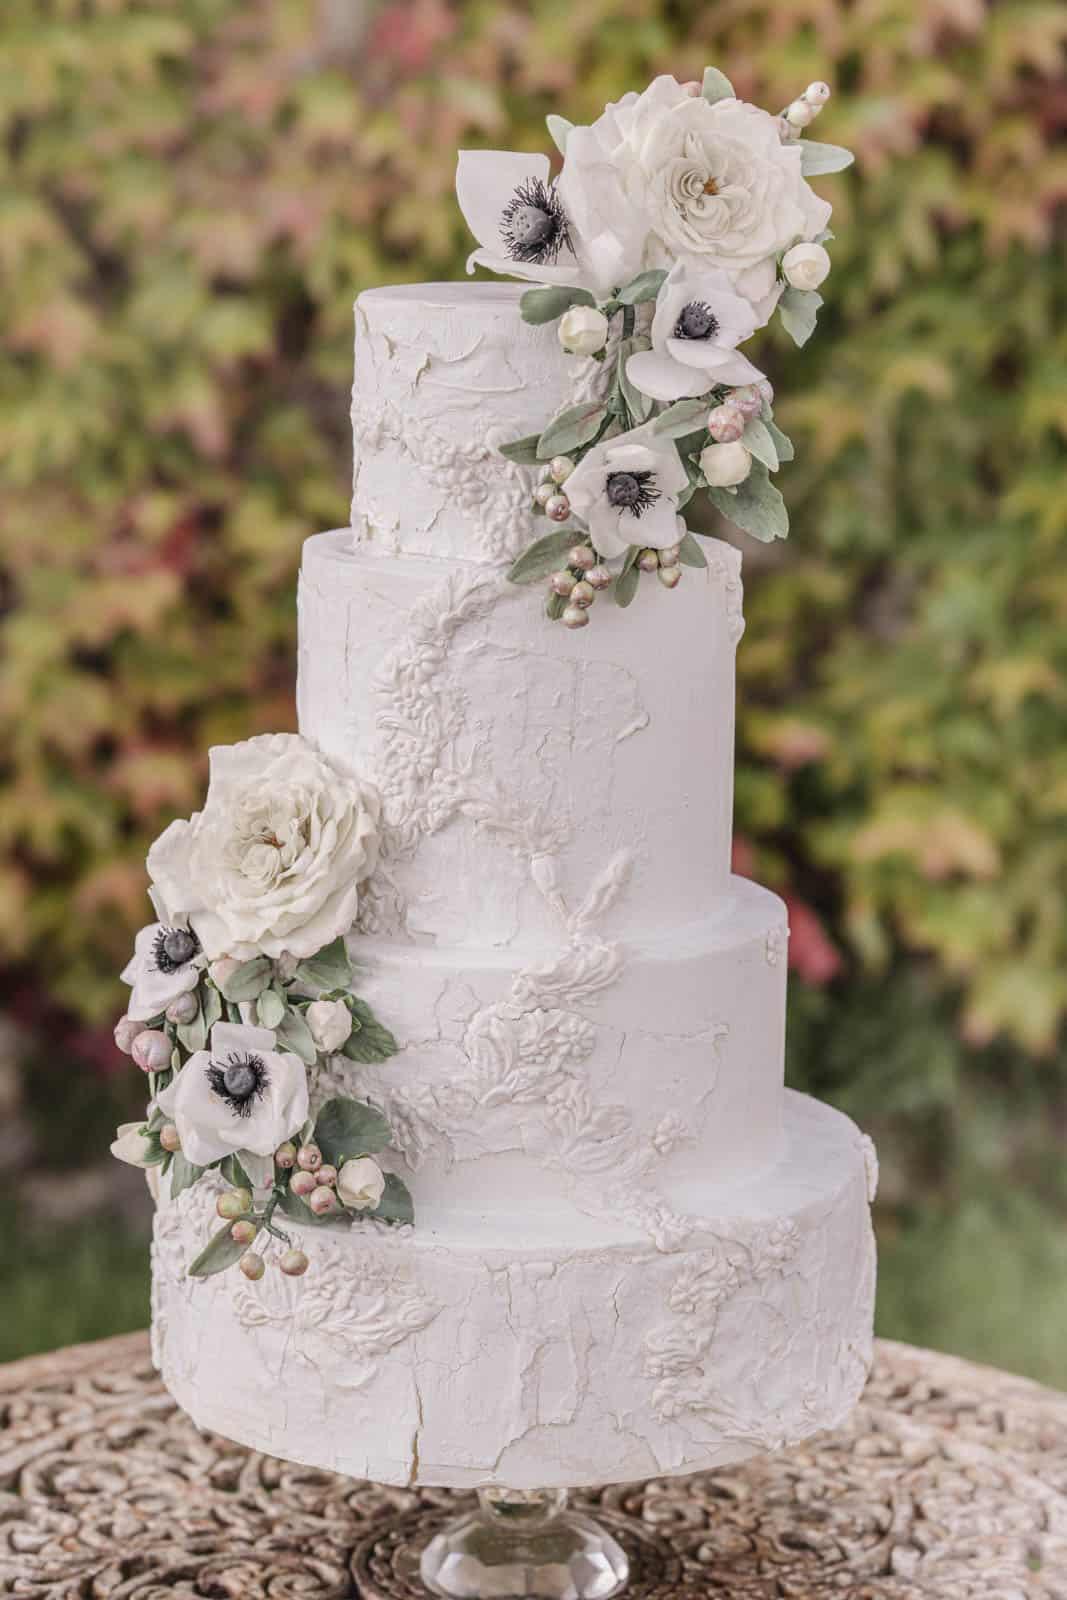 Romantic tiered Cake by Florence Italy Cake Designer Melanie Secciani at Castello di Celsa